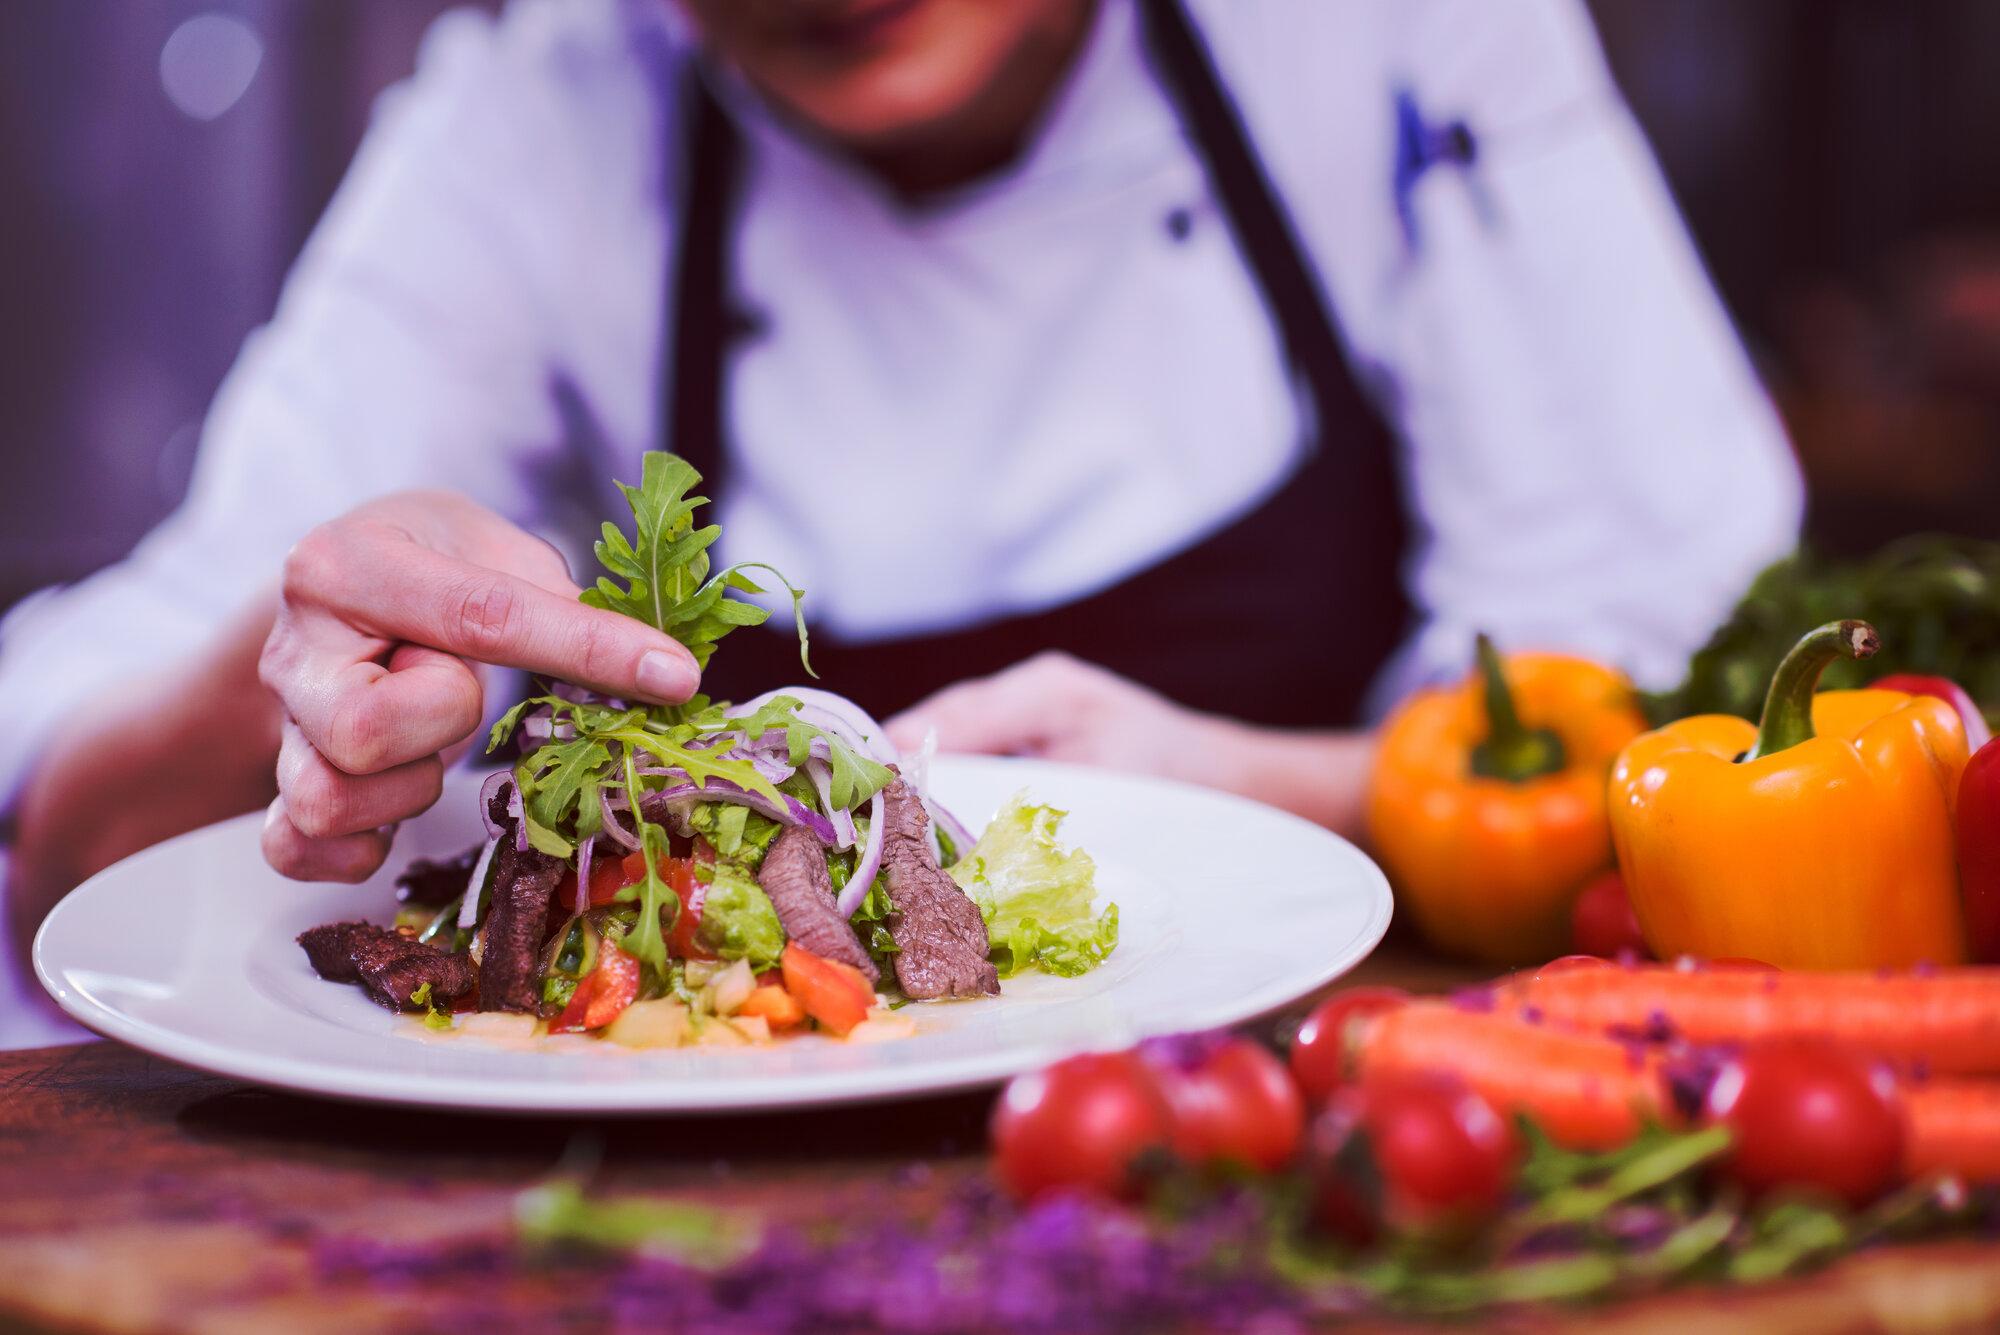 cook chef decorating garnishing prepared meal PVZR26N - Startseite